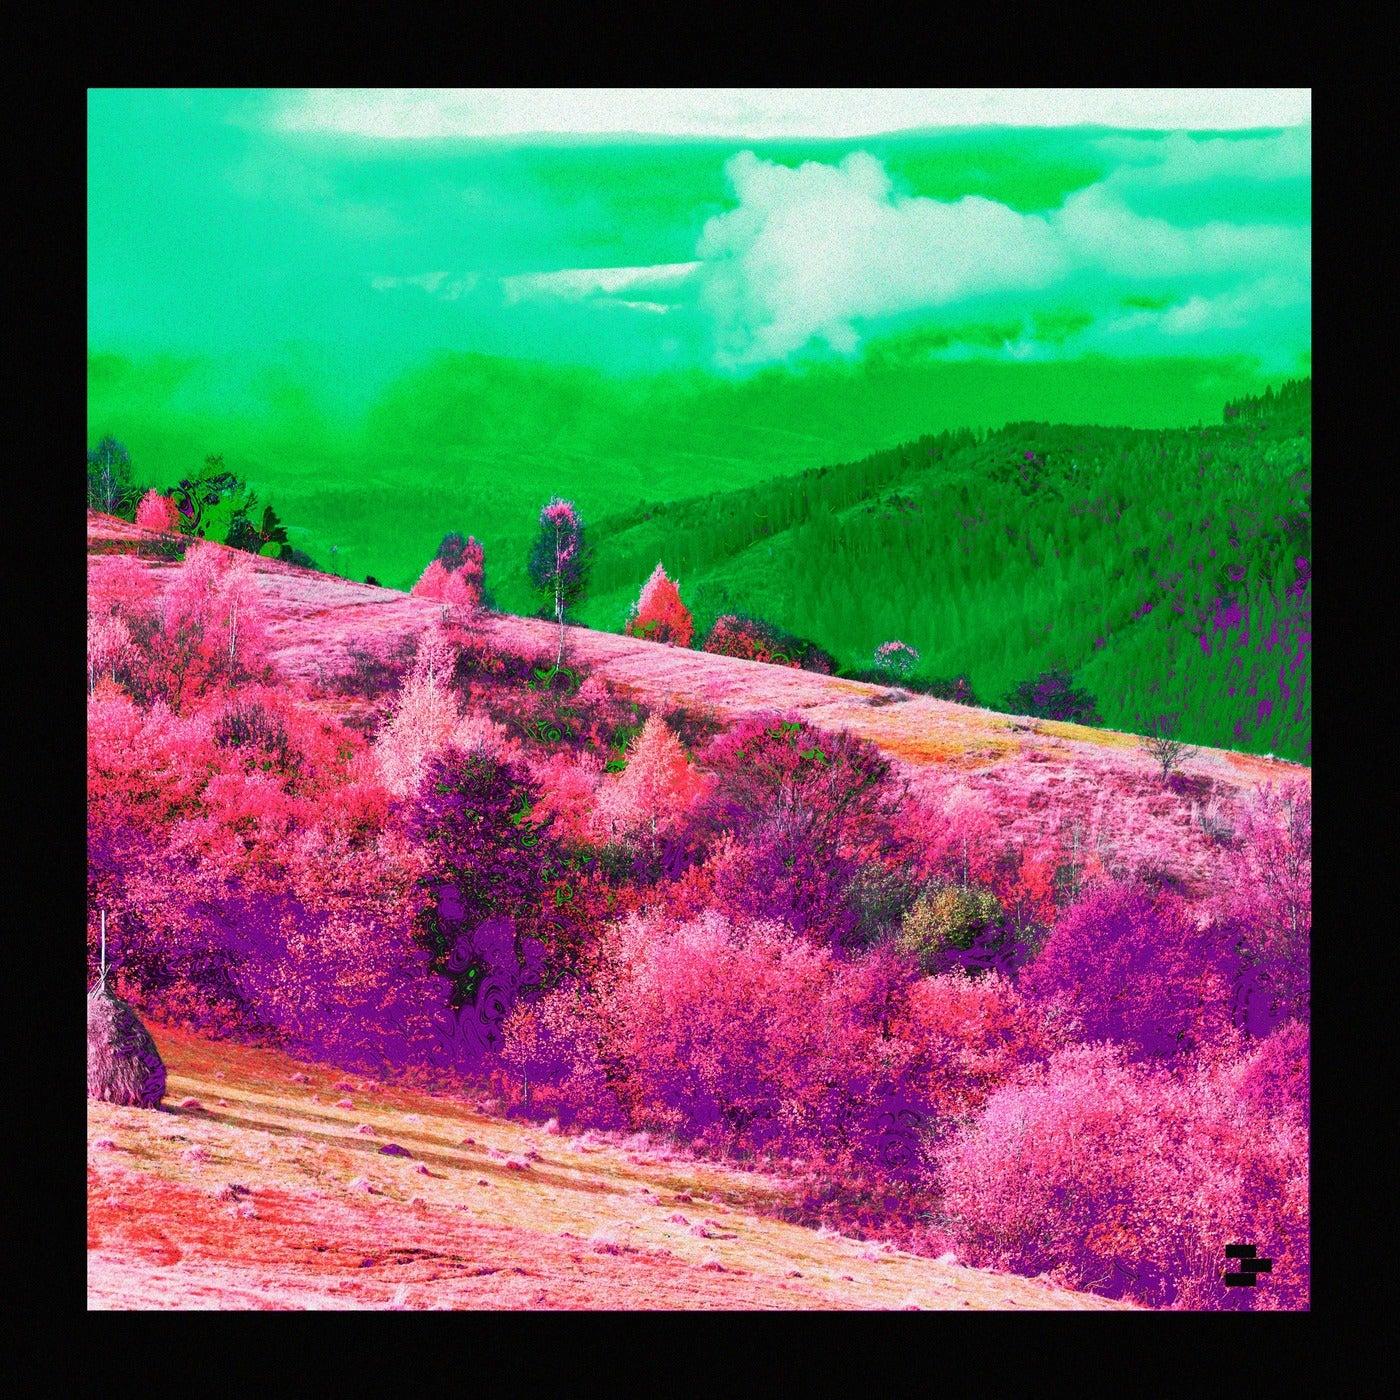 Transition (Lehar Remix)